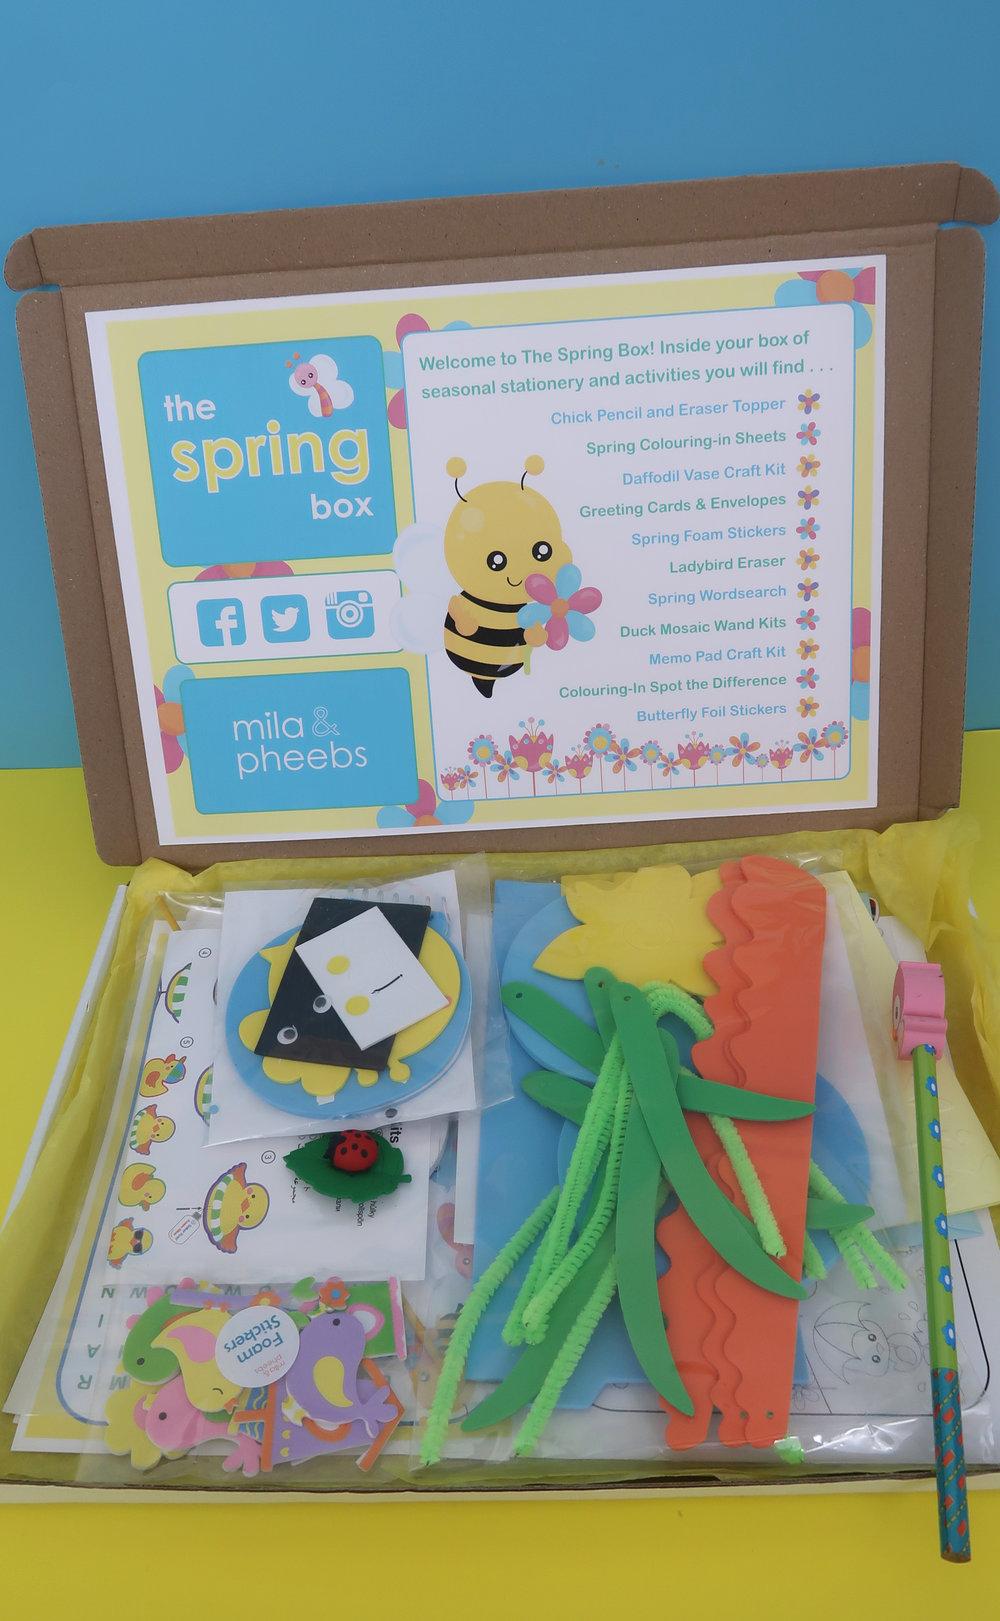 mila and pheebs spring box